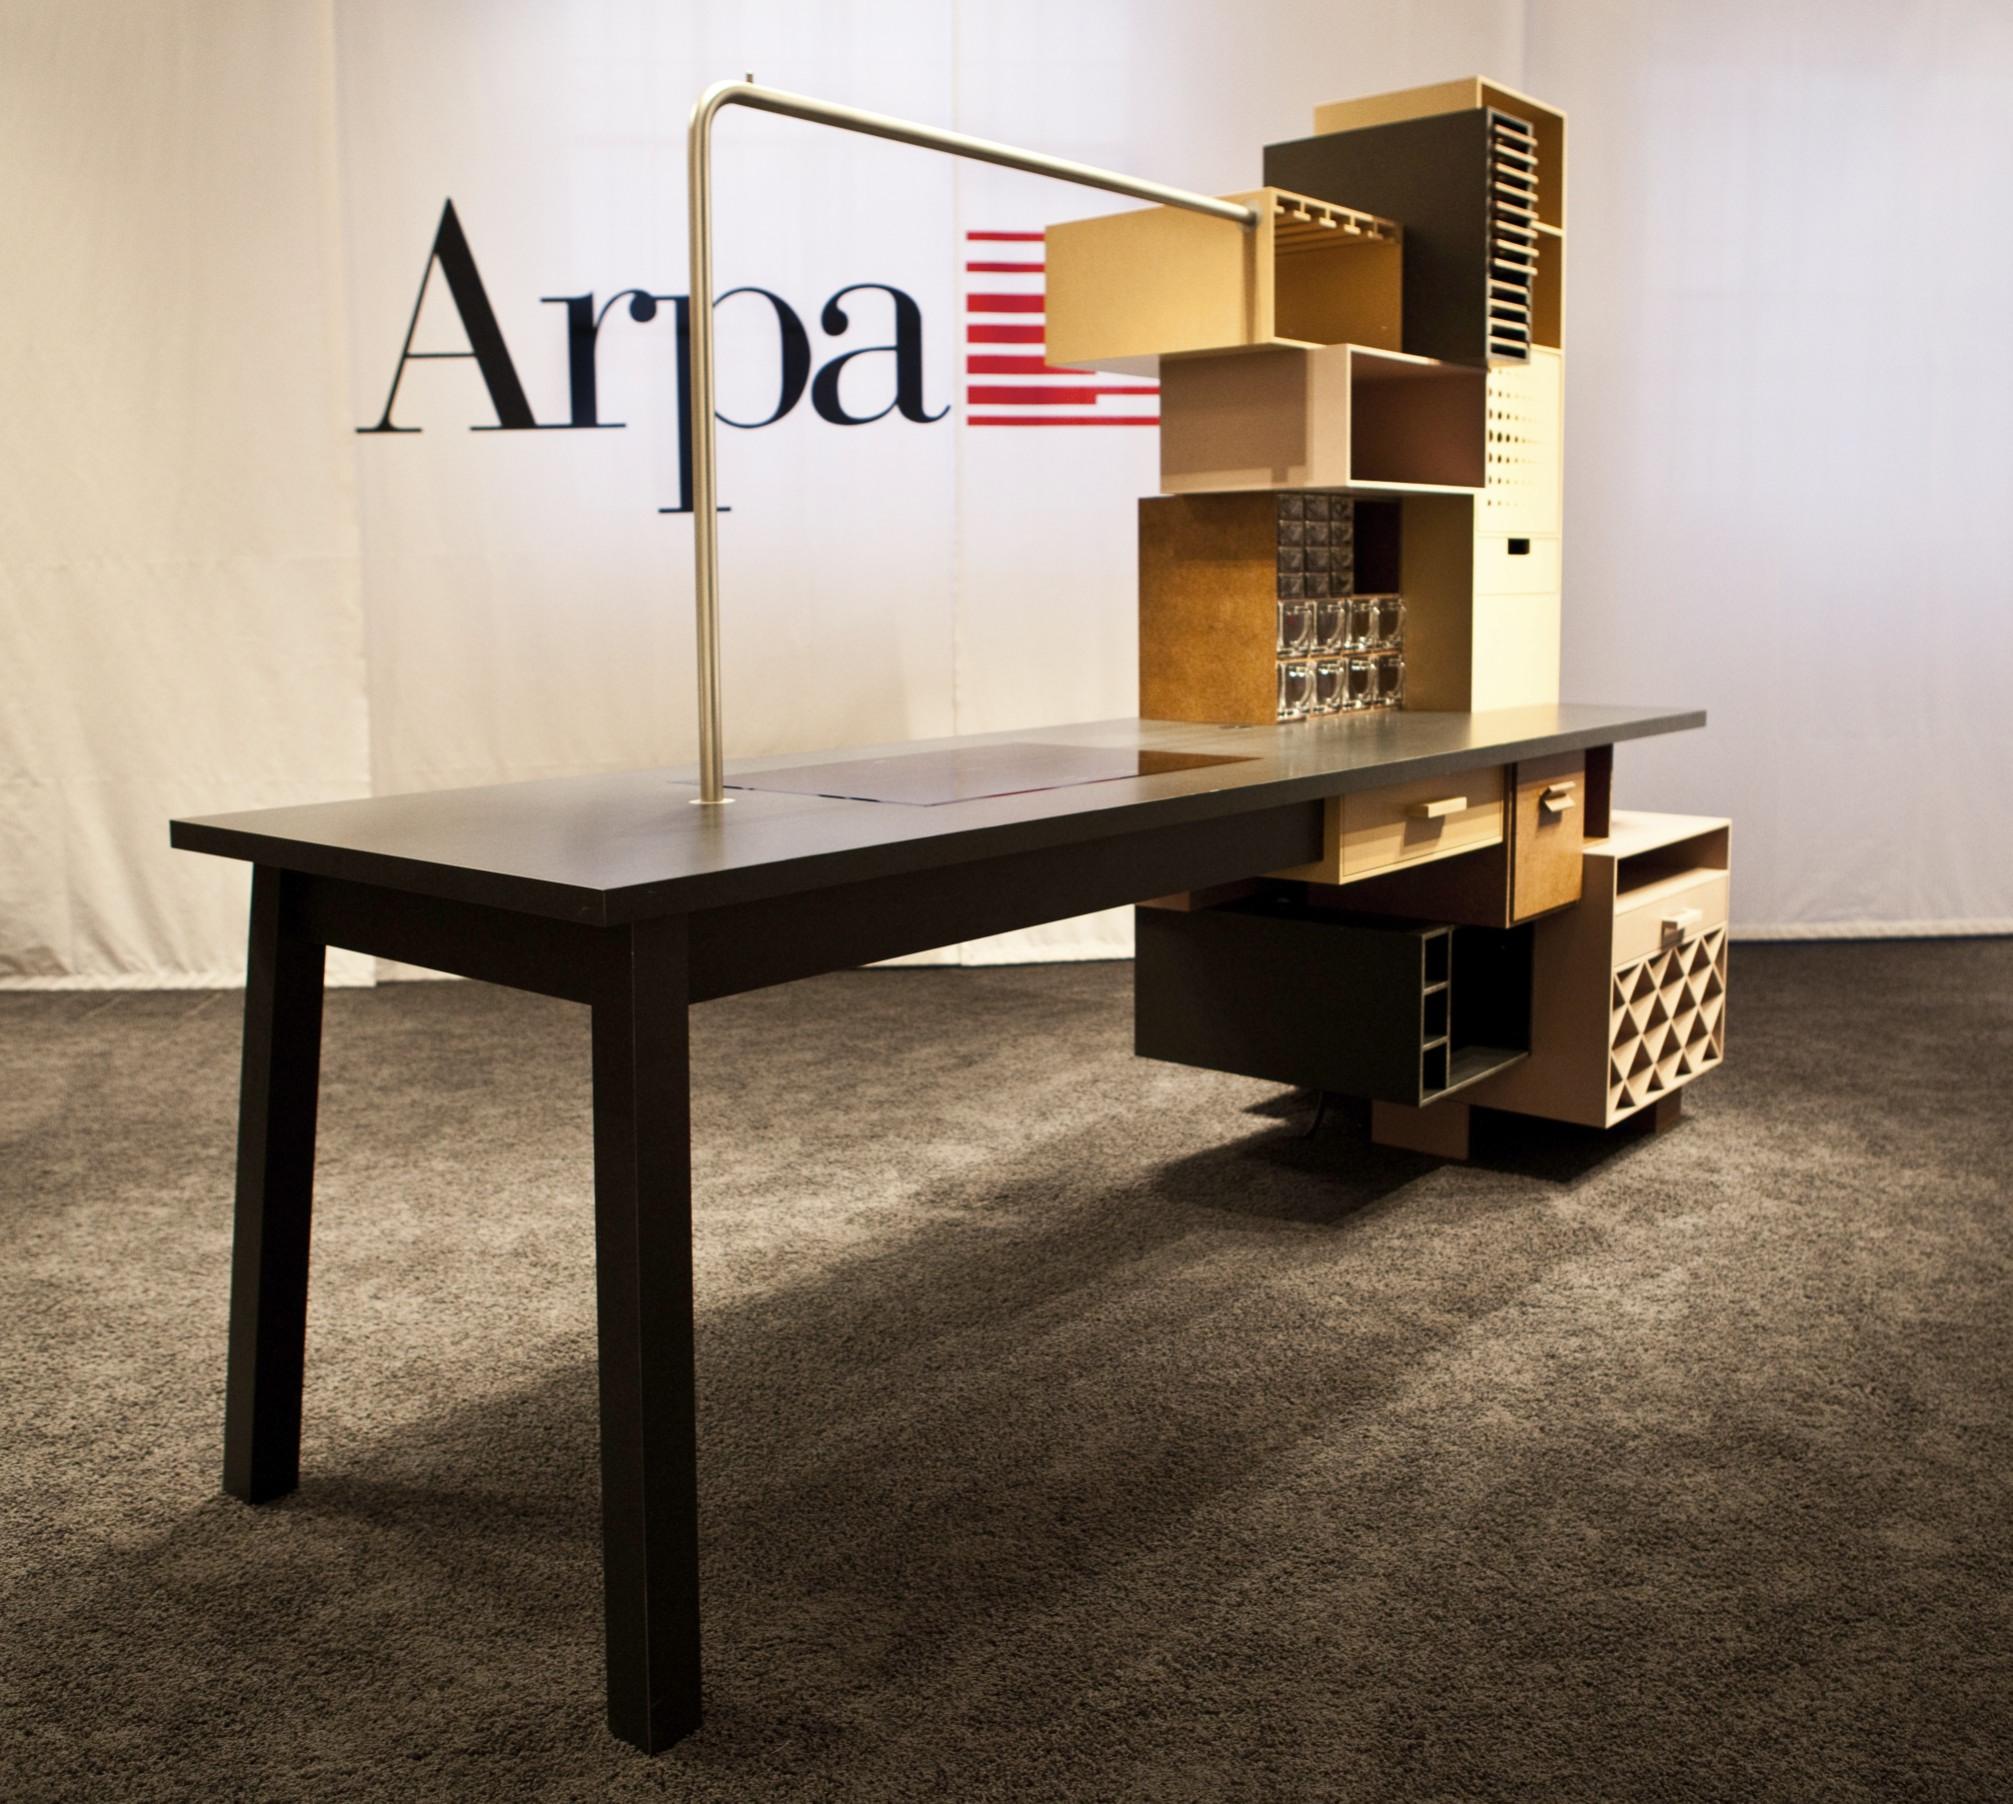 Showküche aus neuartigem Werkstoff, arpa naturalia, design week Milano